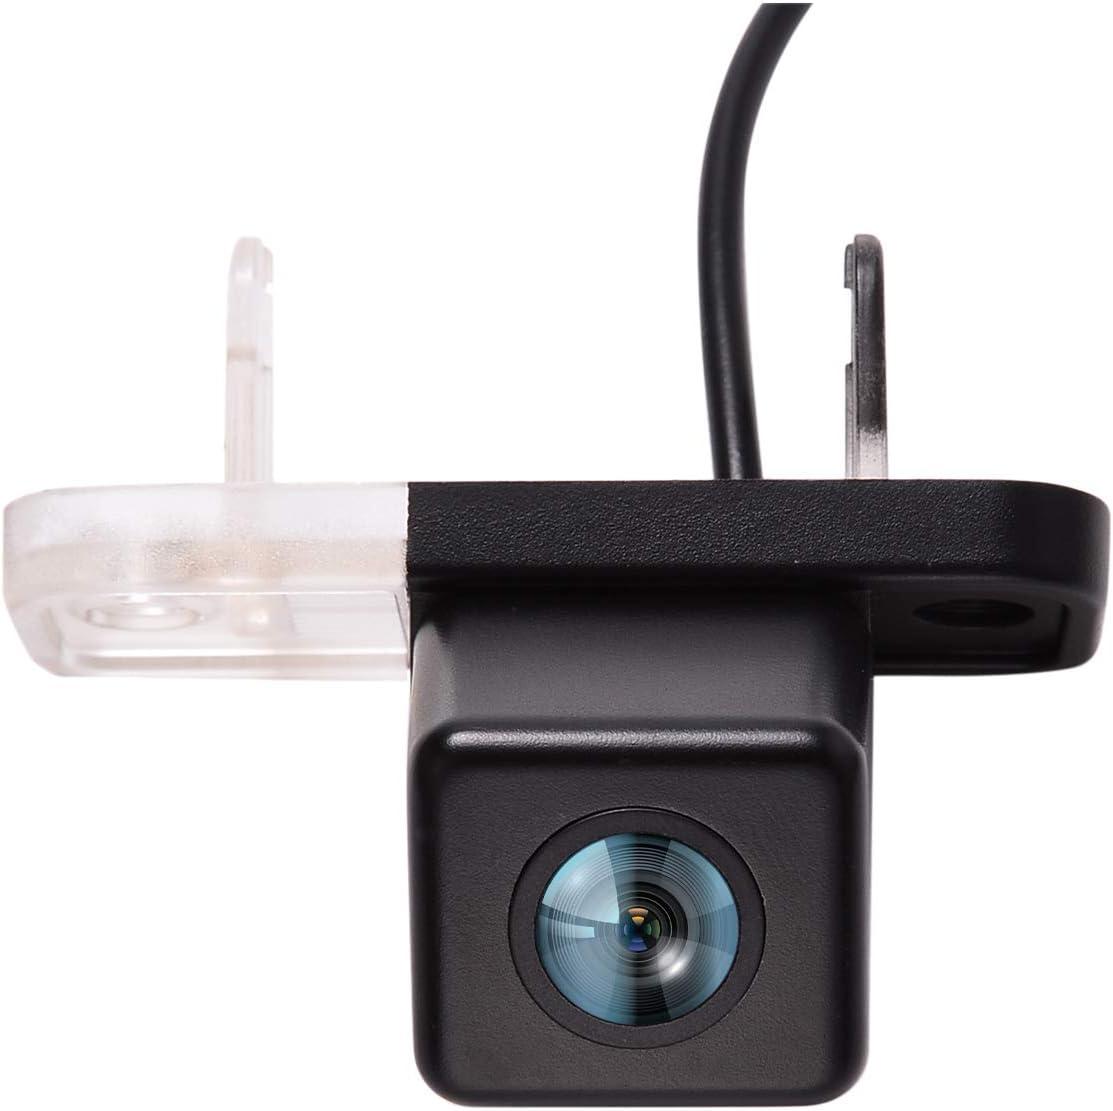 CUHAWUDBA Rear View Camera Night-Vision Waterproof Parking Reverse Camera for Mercedes Clk W209 W203 W211 W219